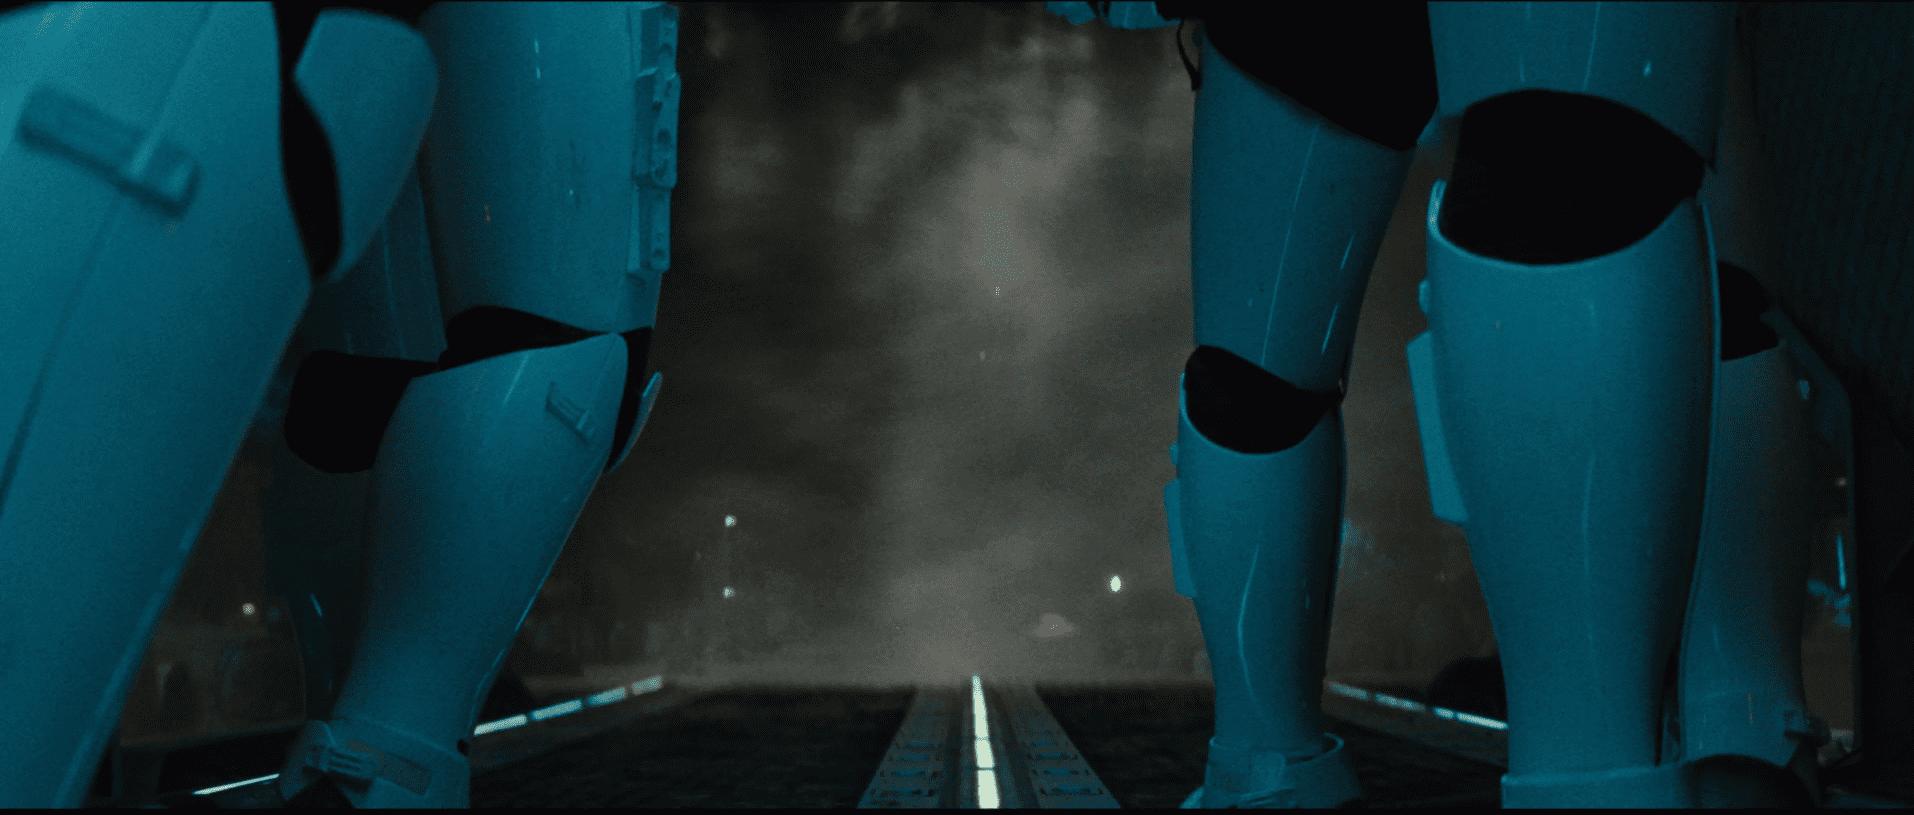 Star Wars Episode VII The Force Awakens Wallpaper 007